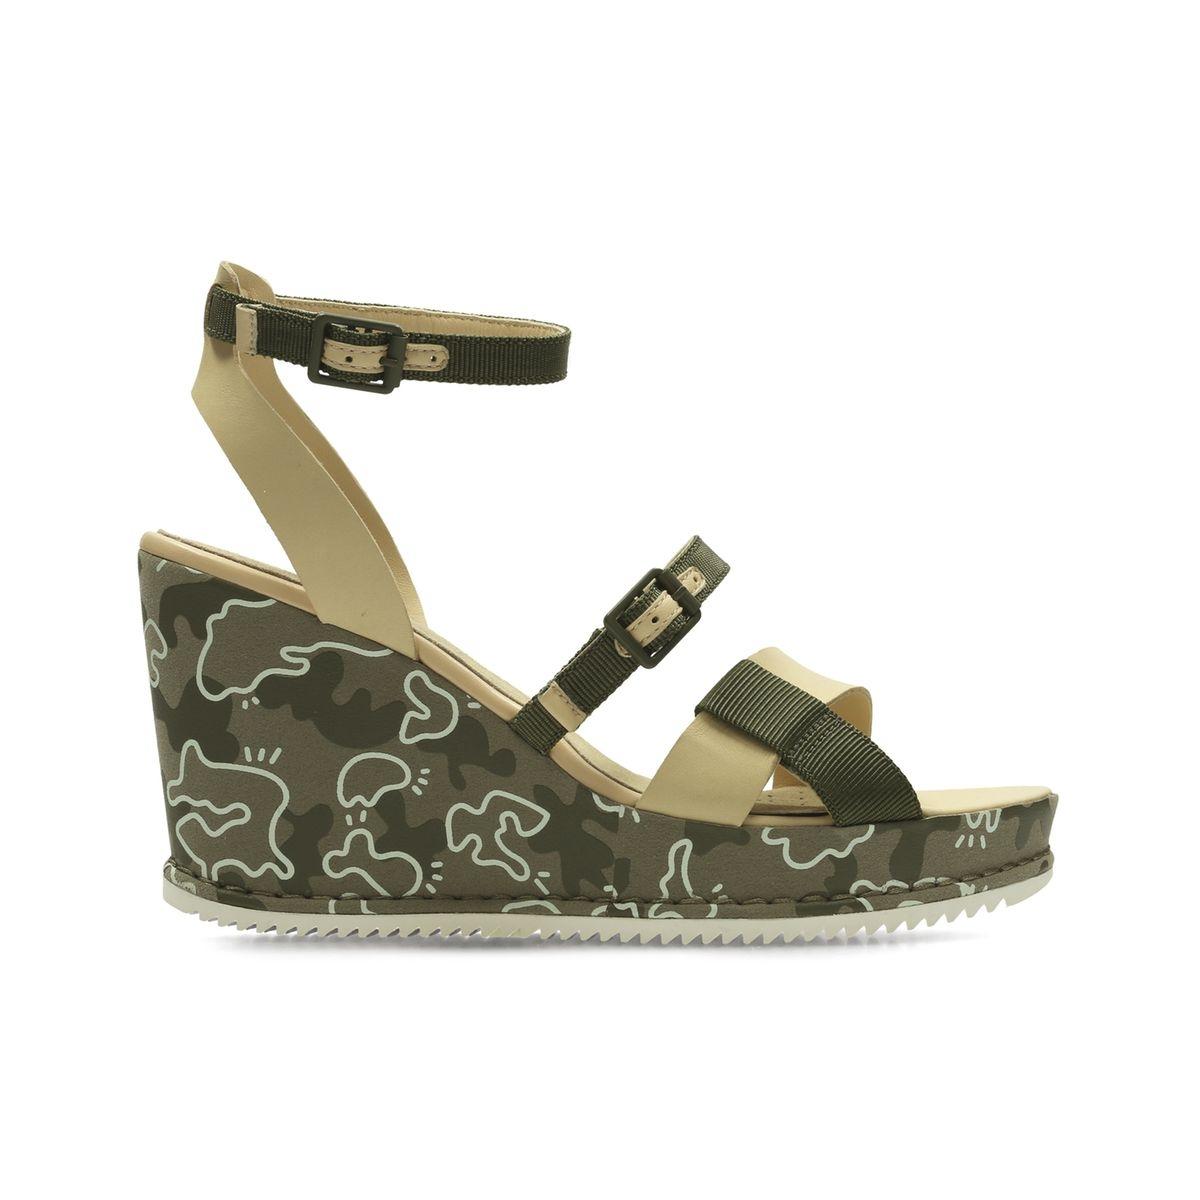 Sandales cuir compensées Adesha Art